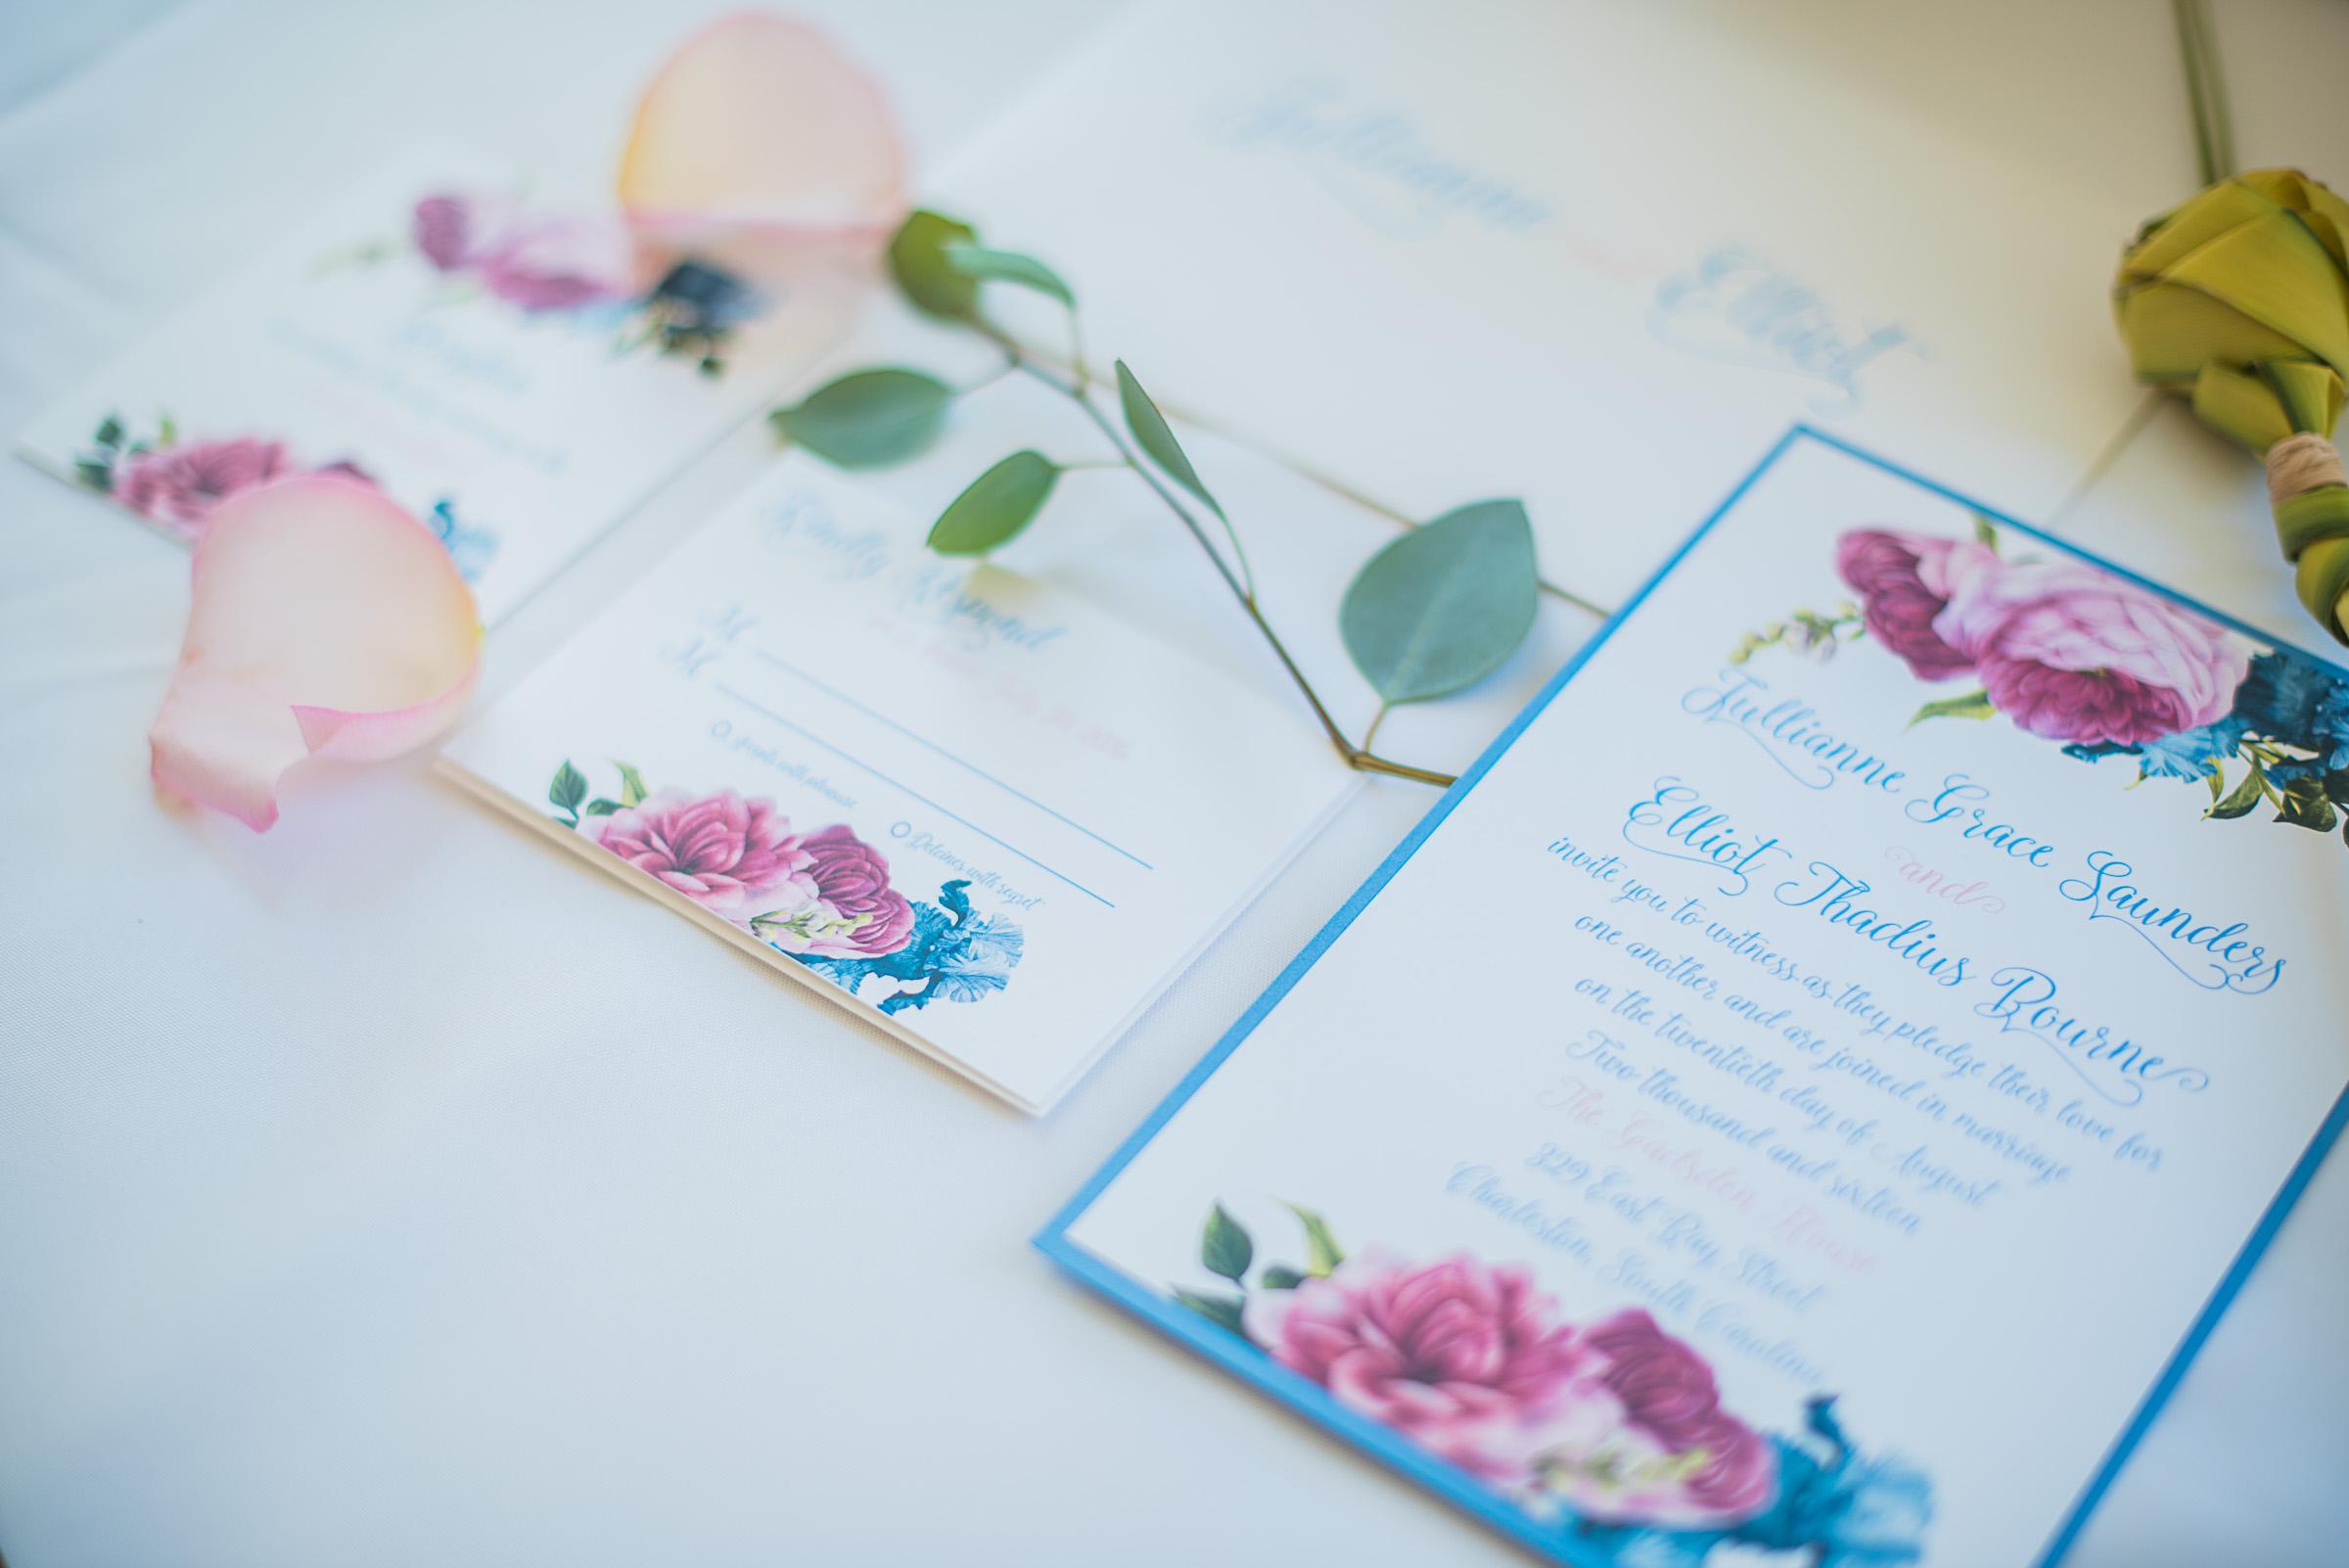 Romantic Charleston wedding invitatoins